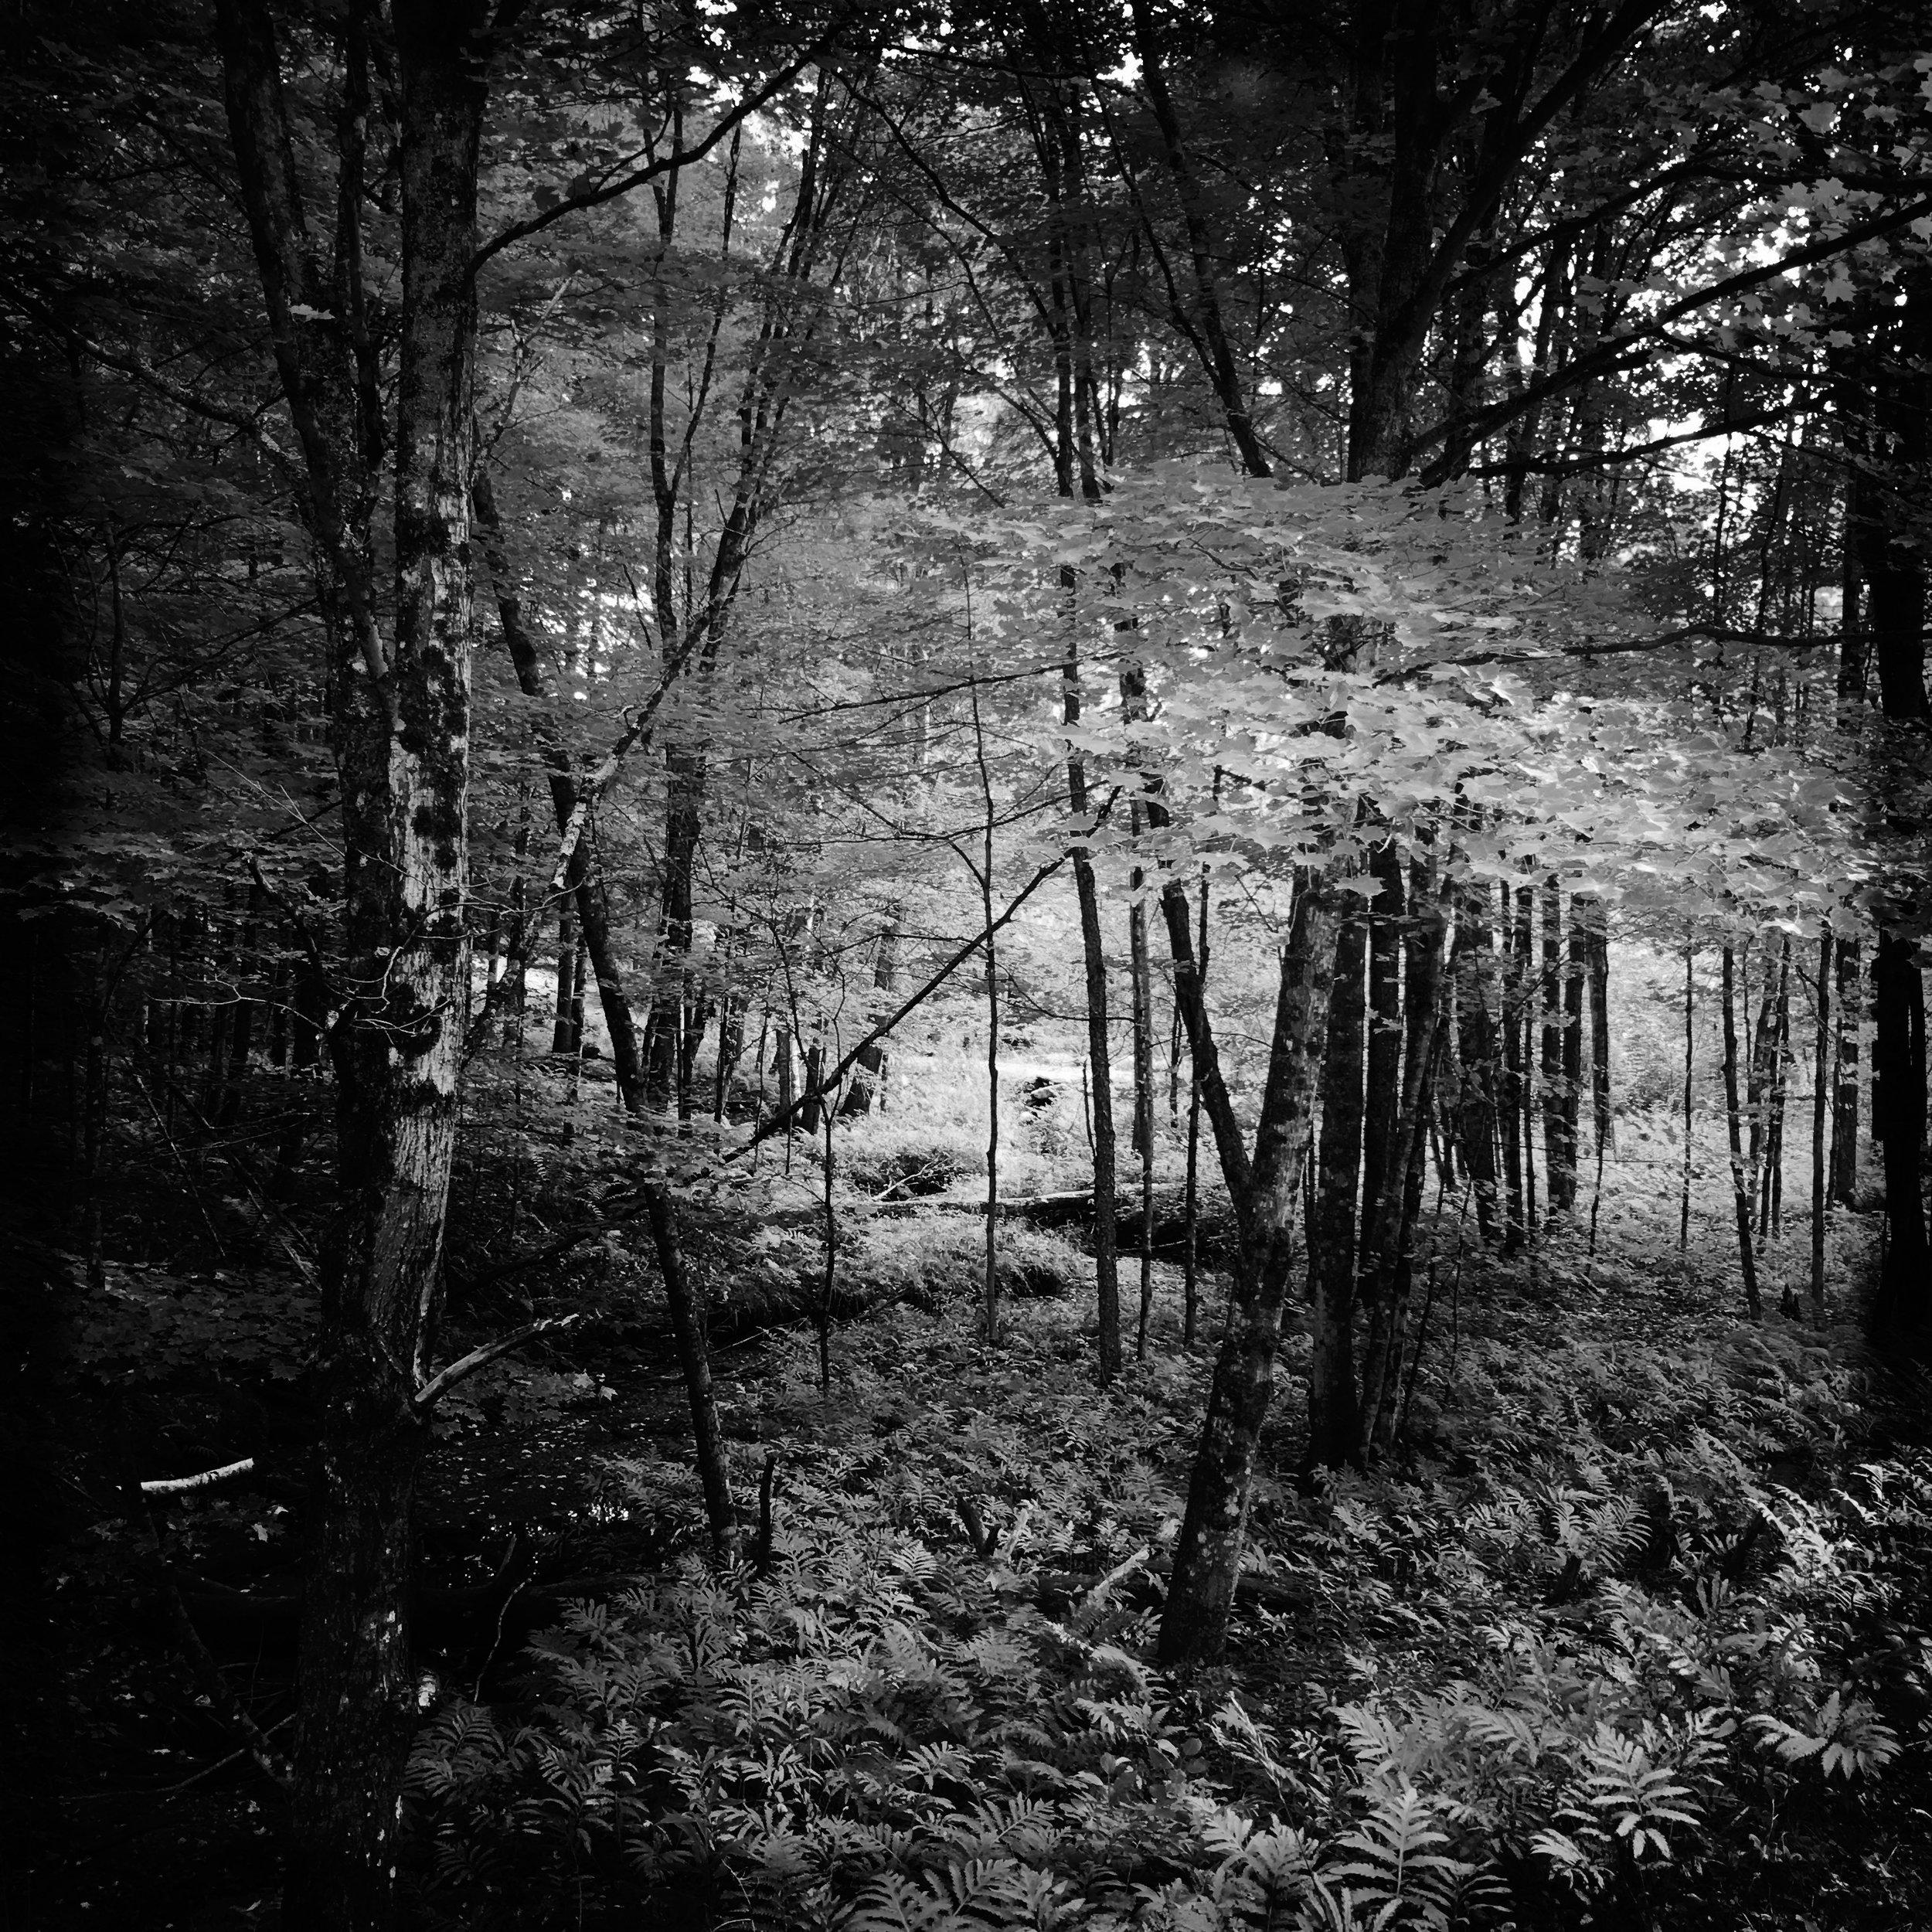 ©Woods in Black & White by Dena T Bray